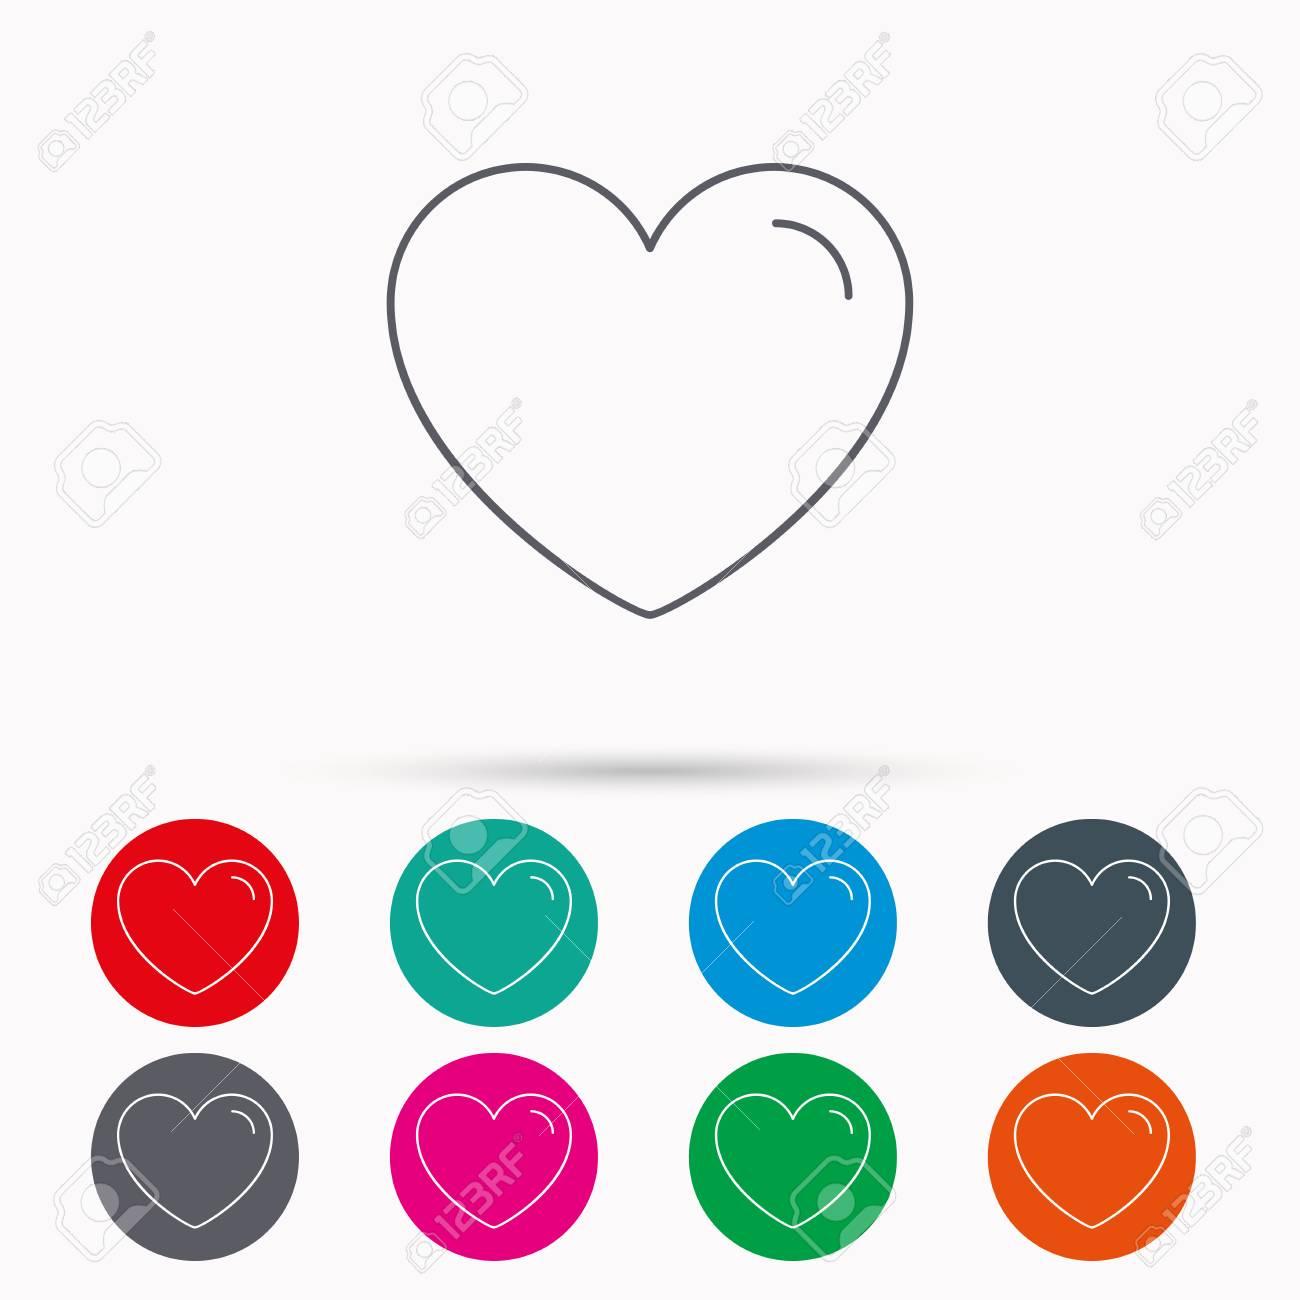 Love heart icon life sign like symbol linear icons in circles love heart icon life sign like symbol linear icons in circles on white buycottarizona